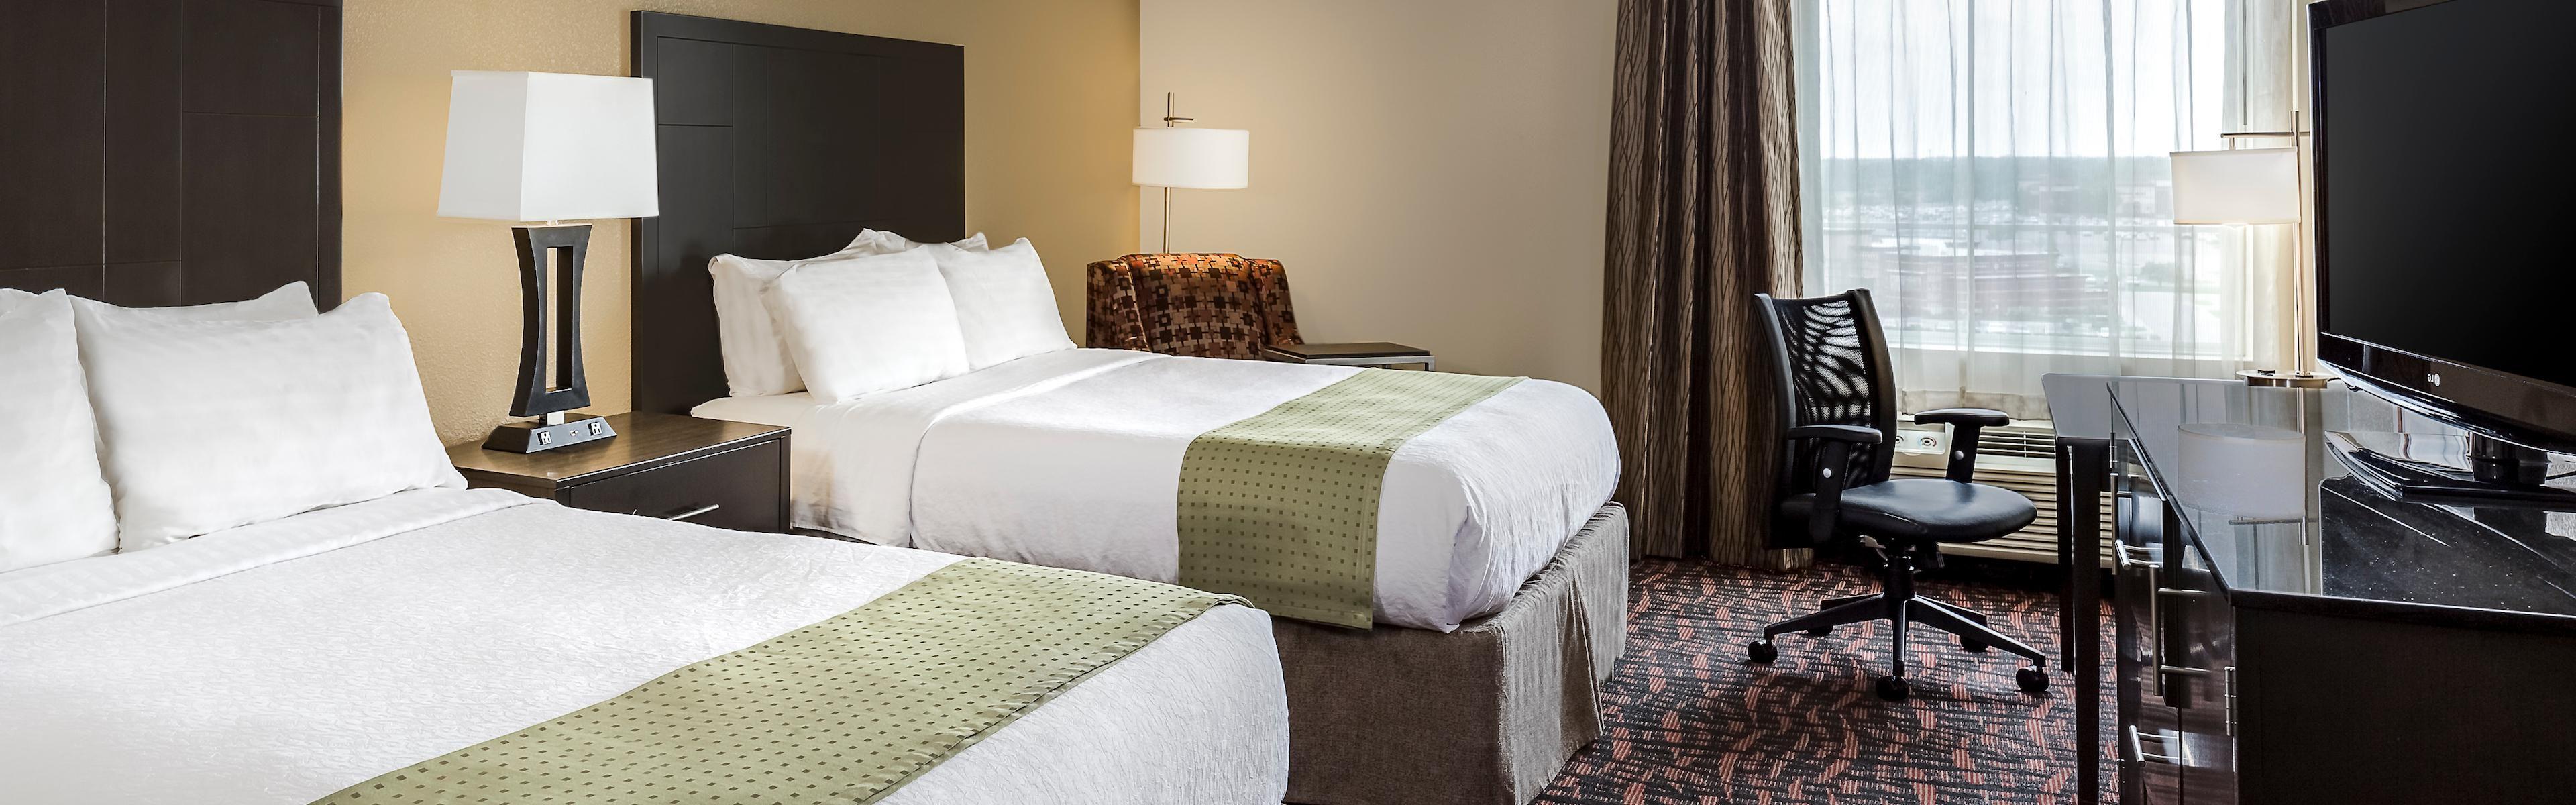 Holiday Inn Wichita East I-35 image 1